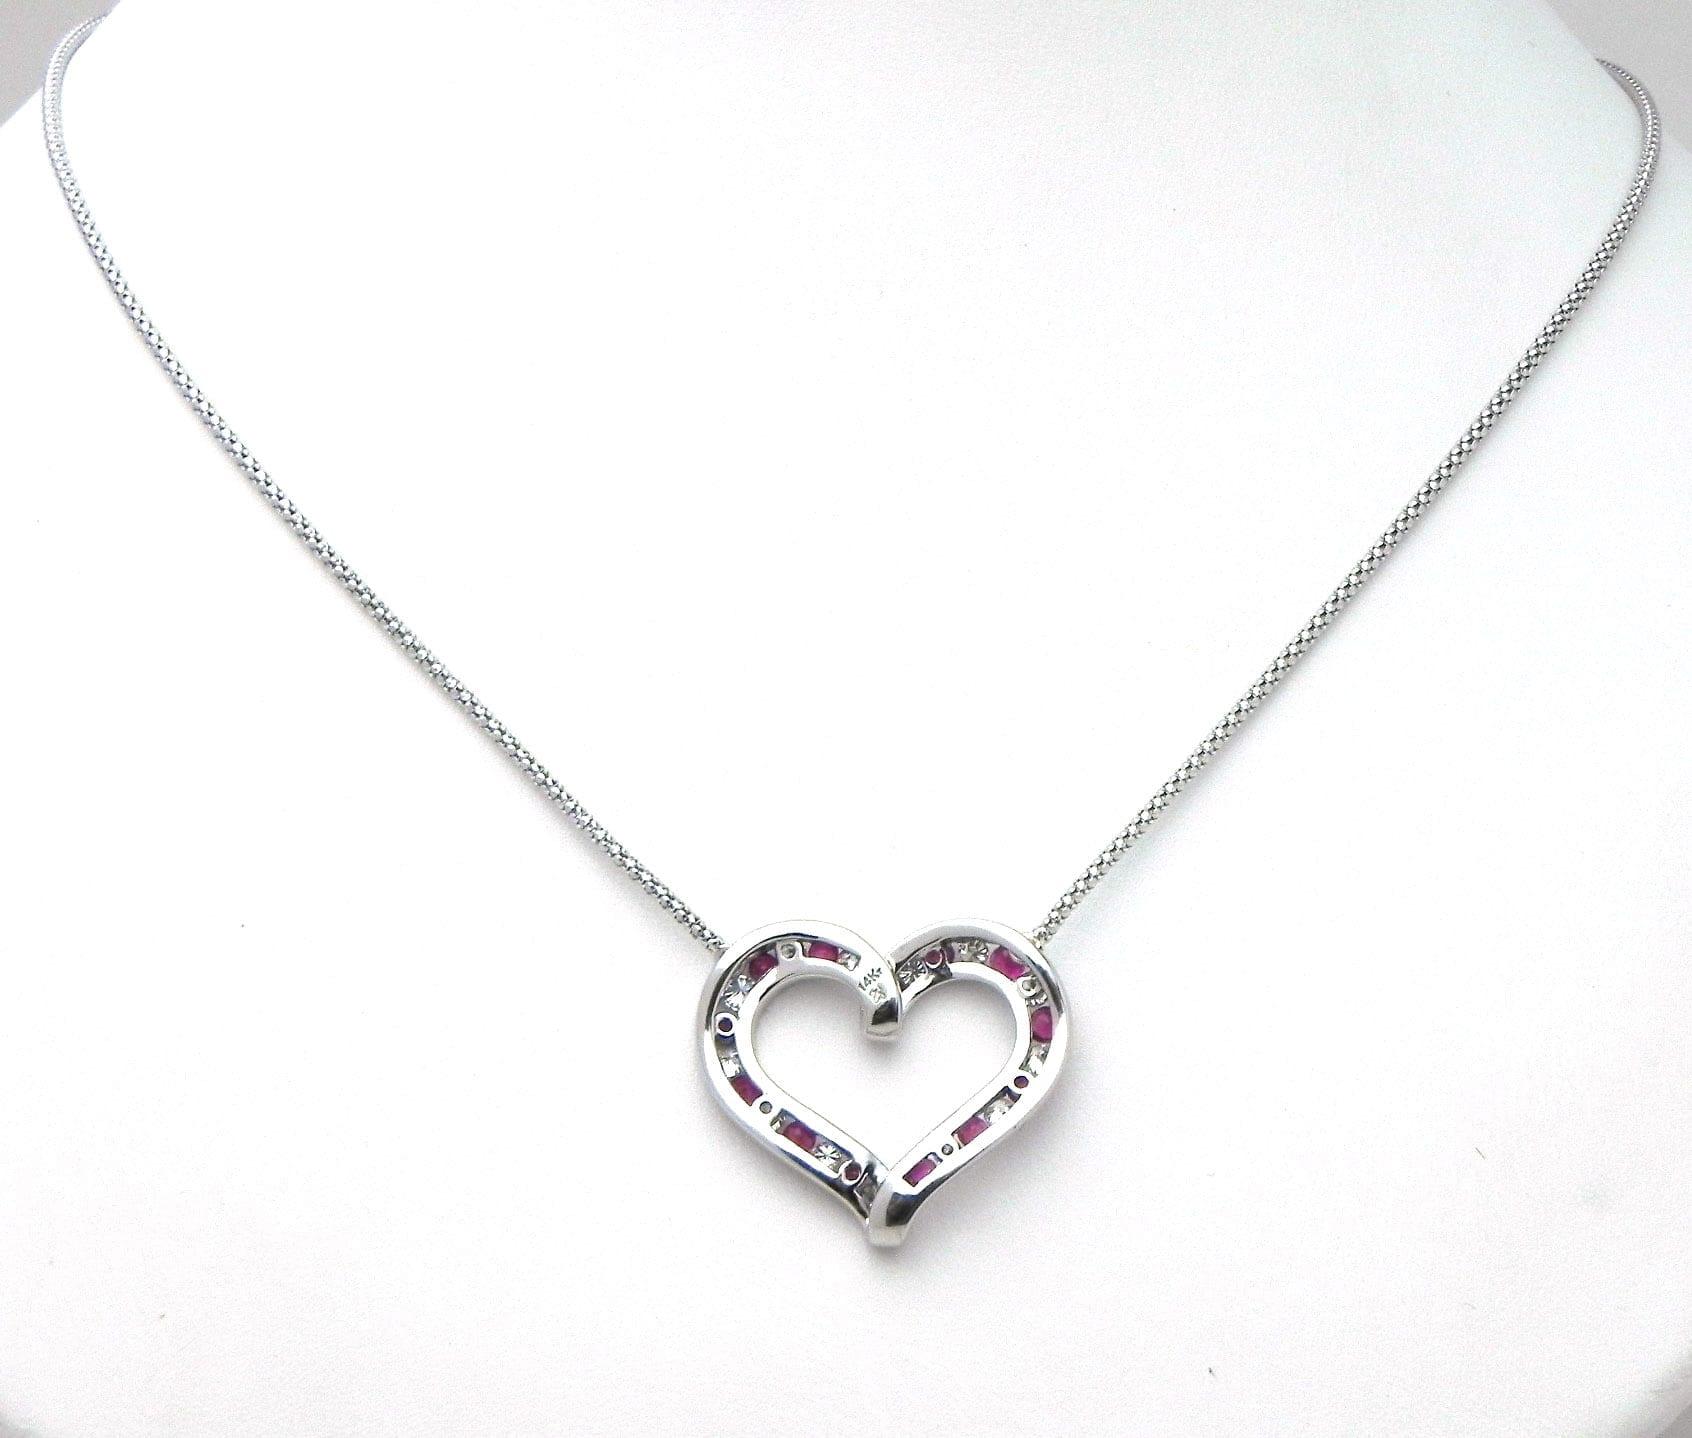 La s 14k White Gold Diamonds & Rubies Open Heart Necklace